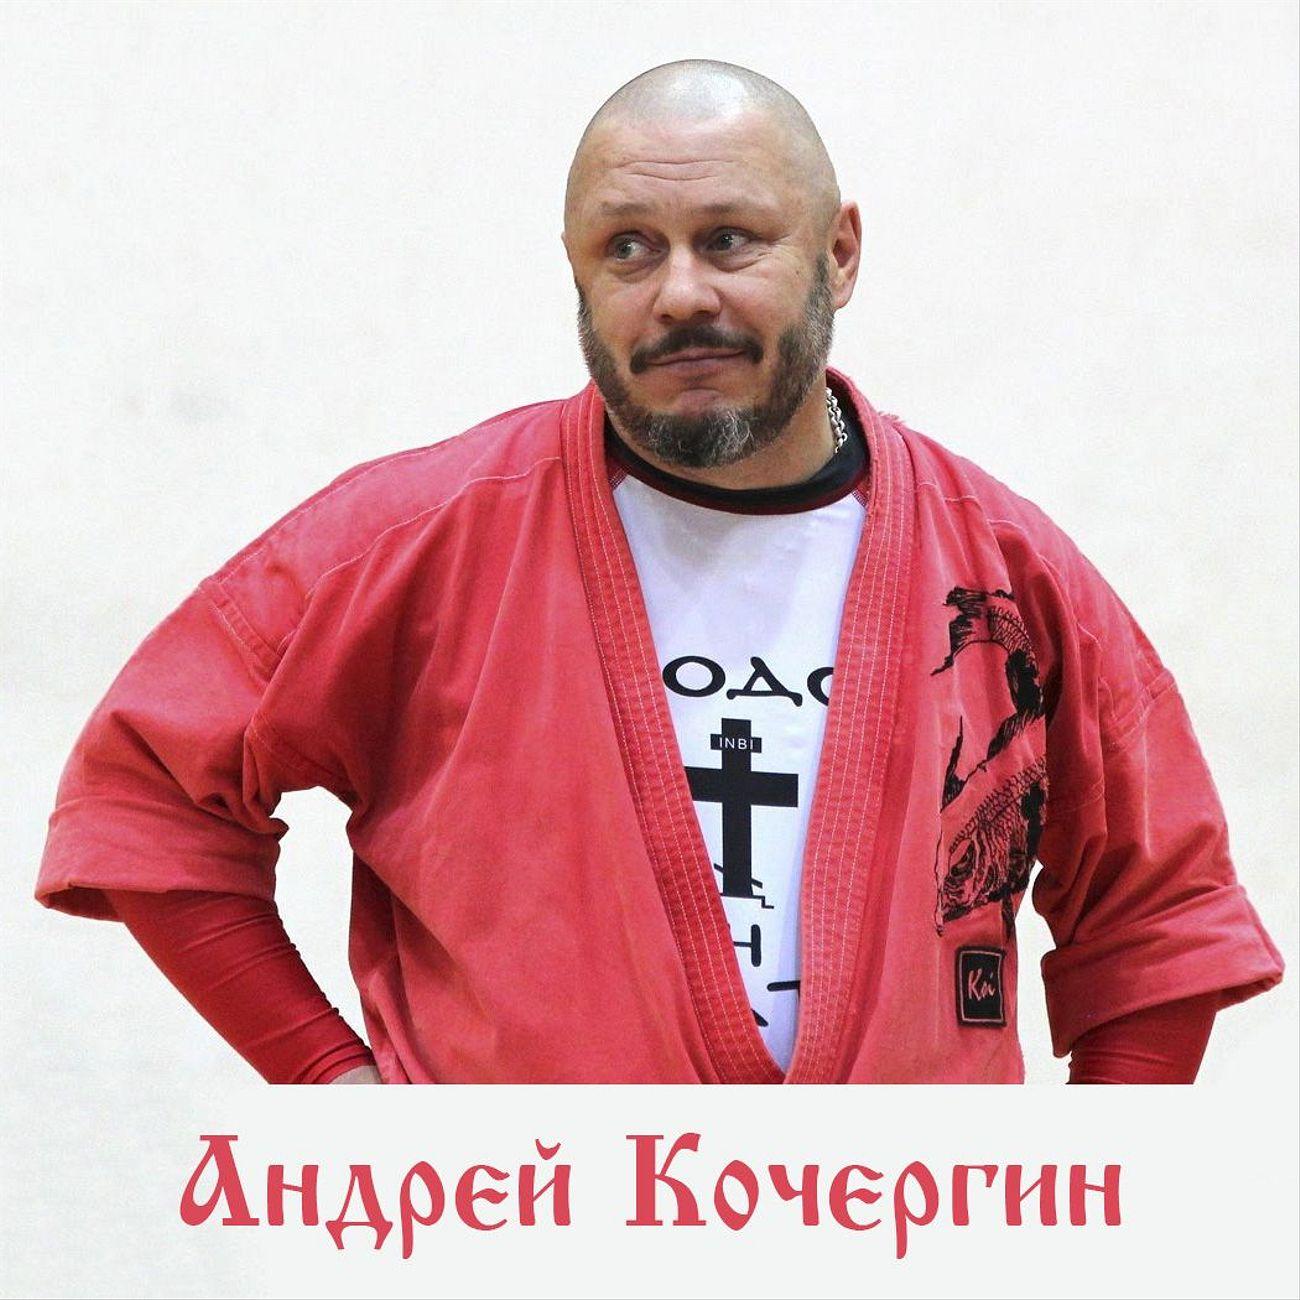 Андрей Кочергин